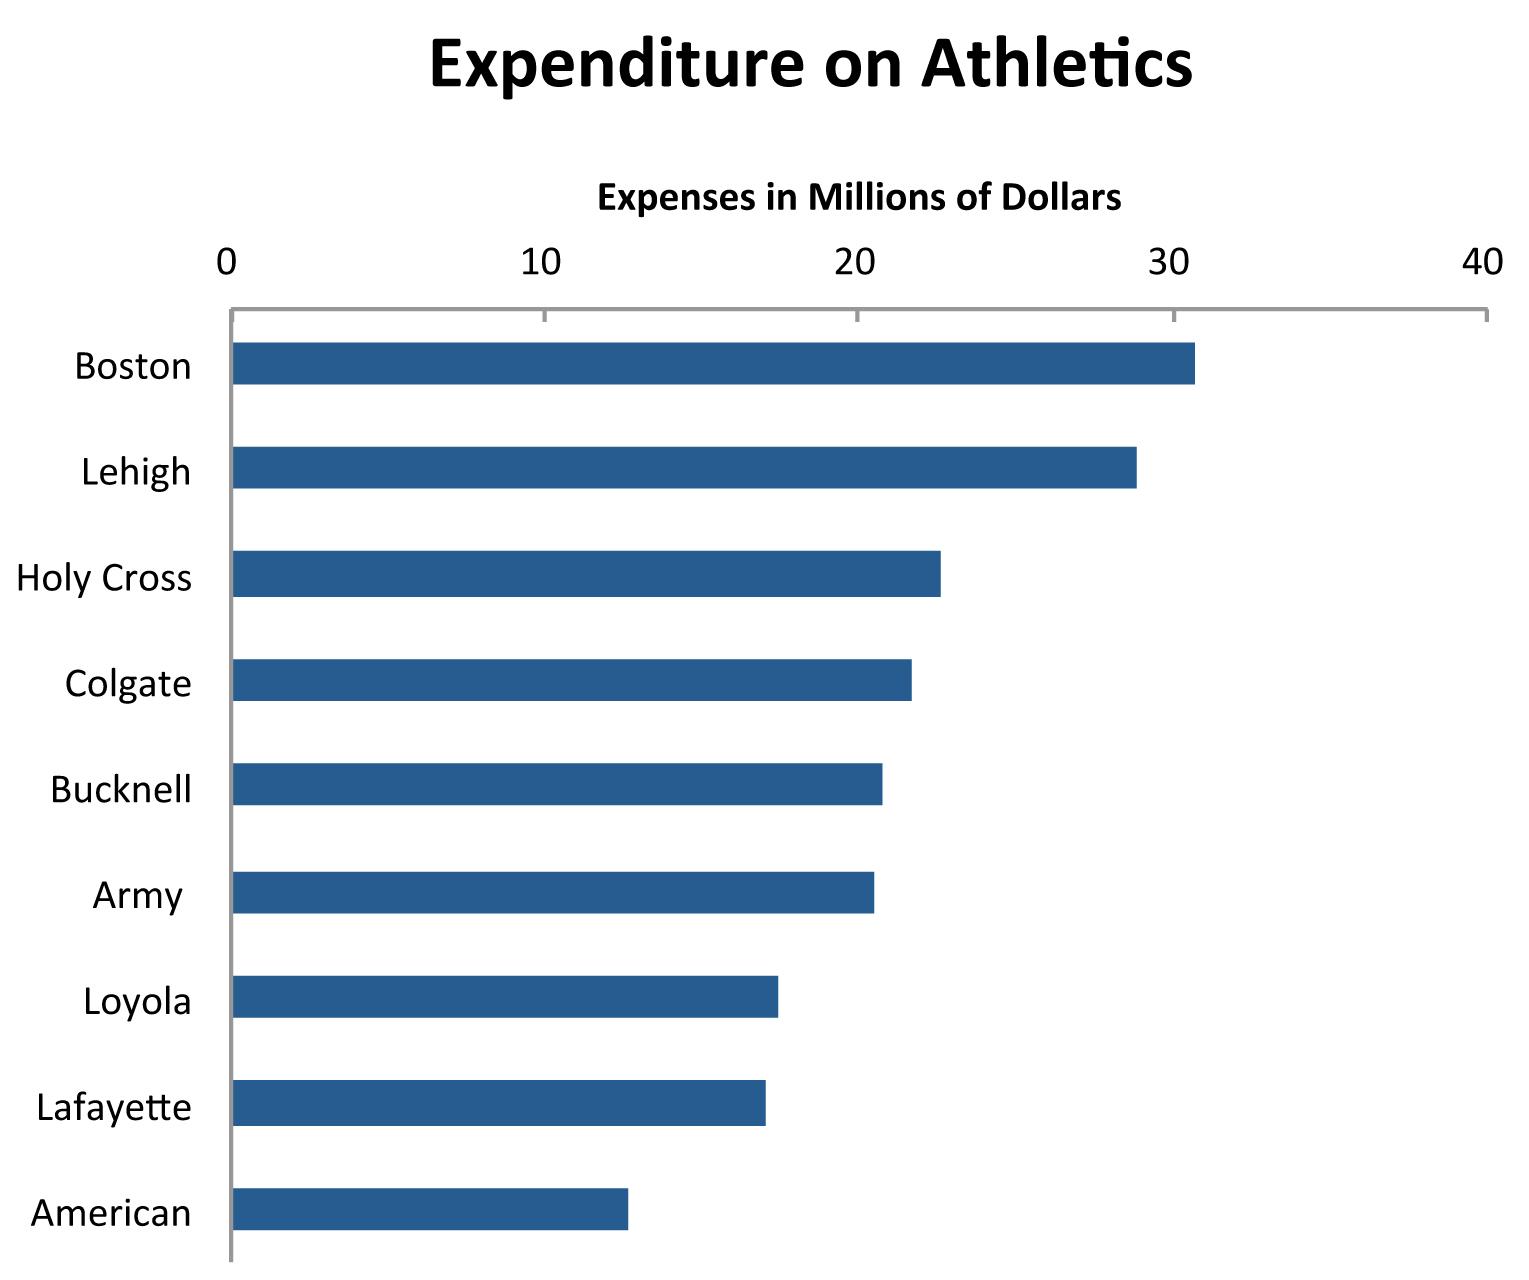 Patriot league football coaches salaries